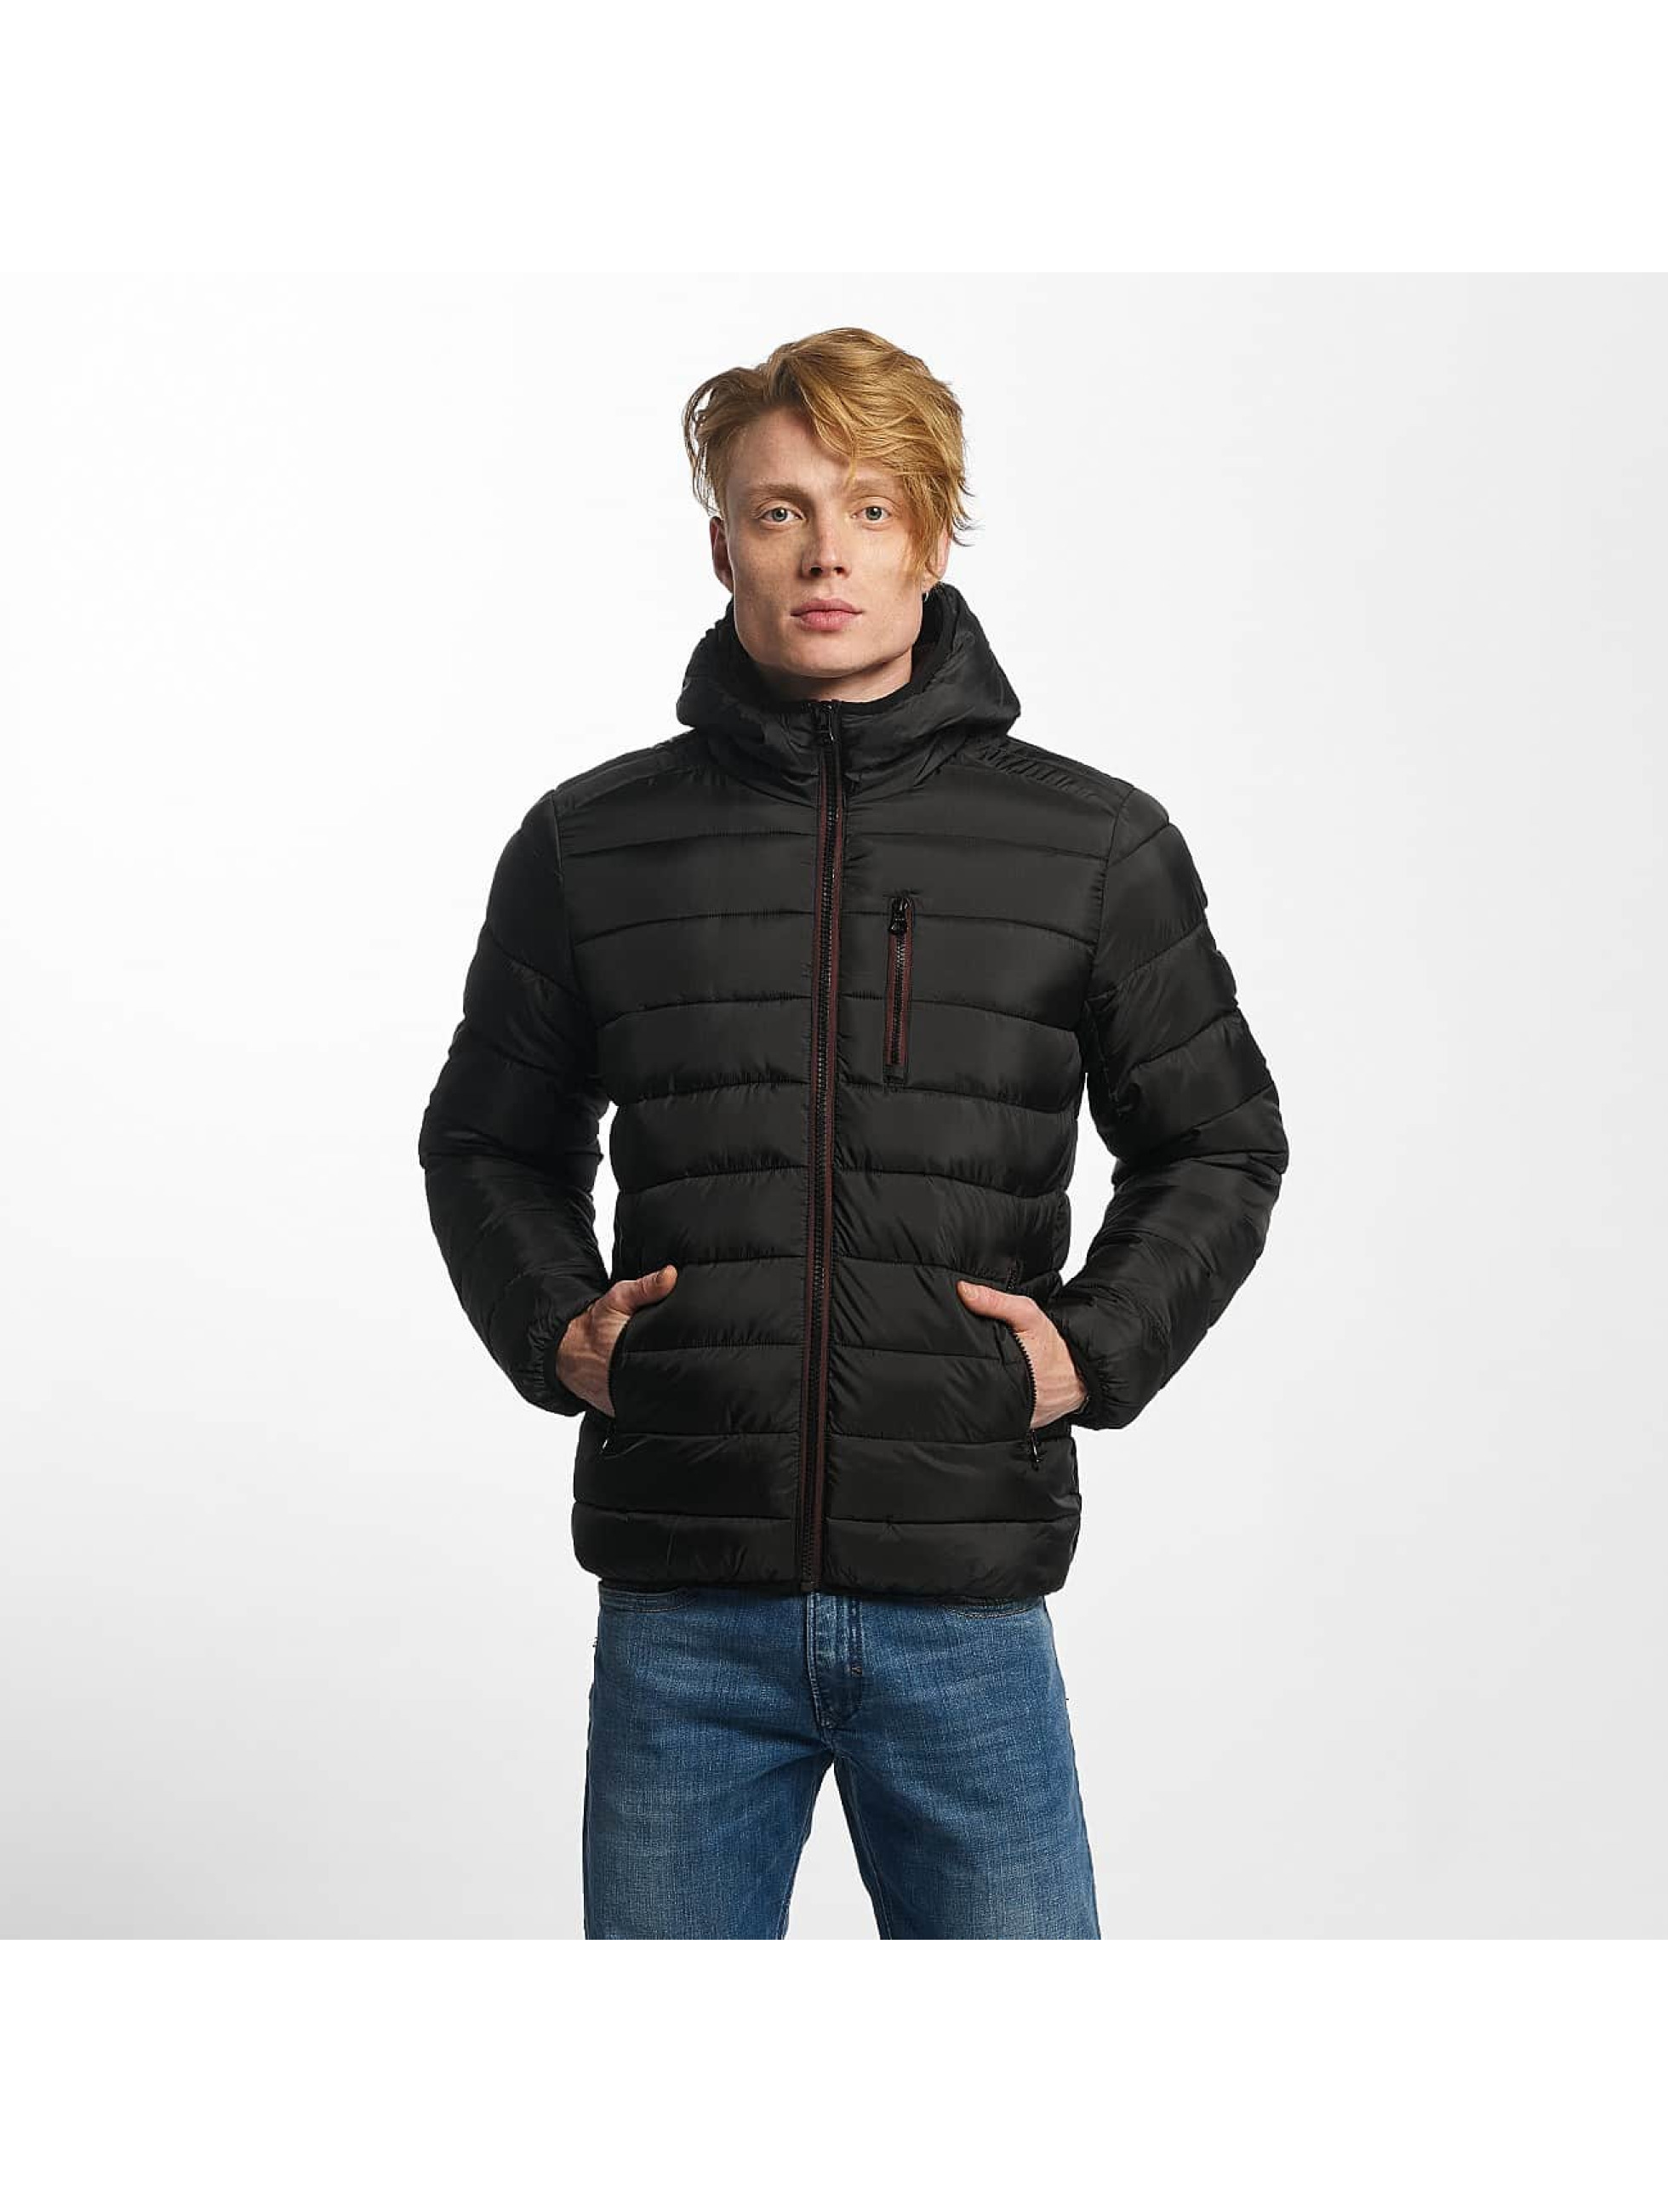 Kaporal Männer Winterjacke Cocoon Out in schwarz